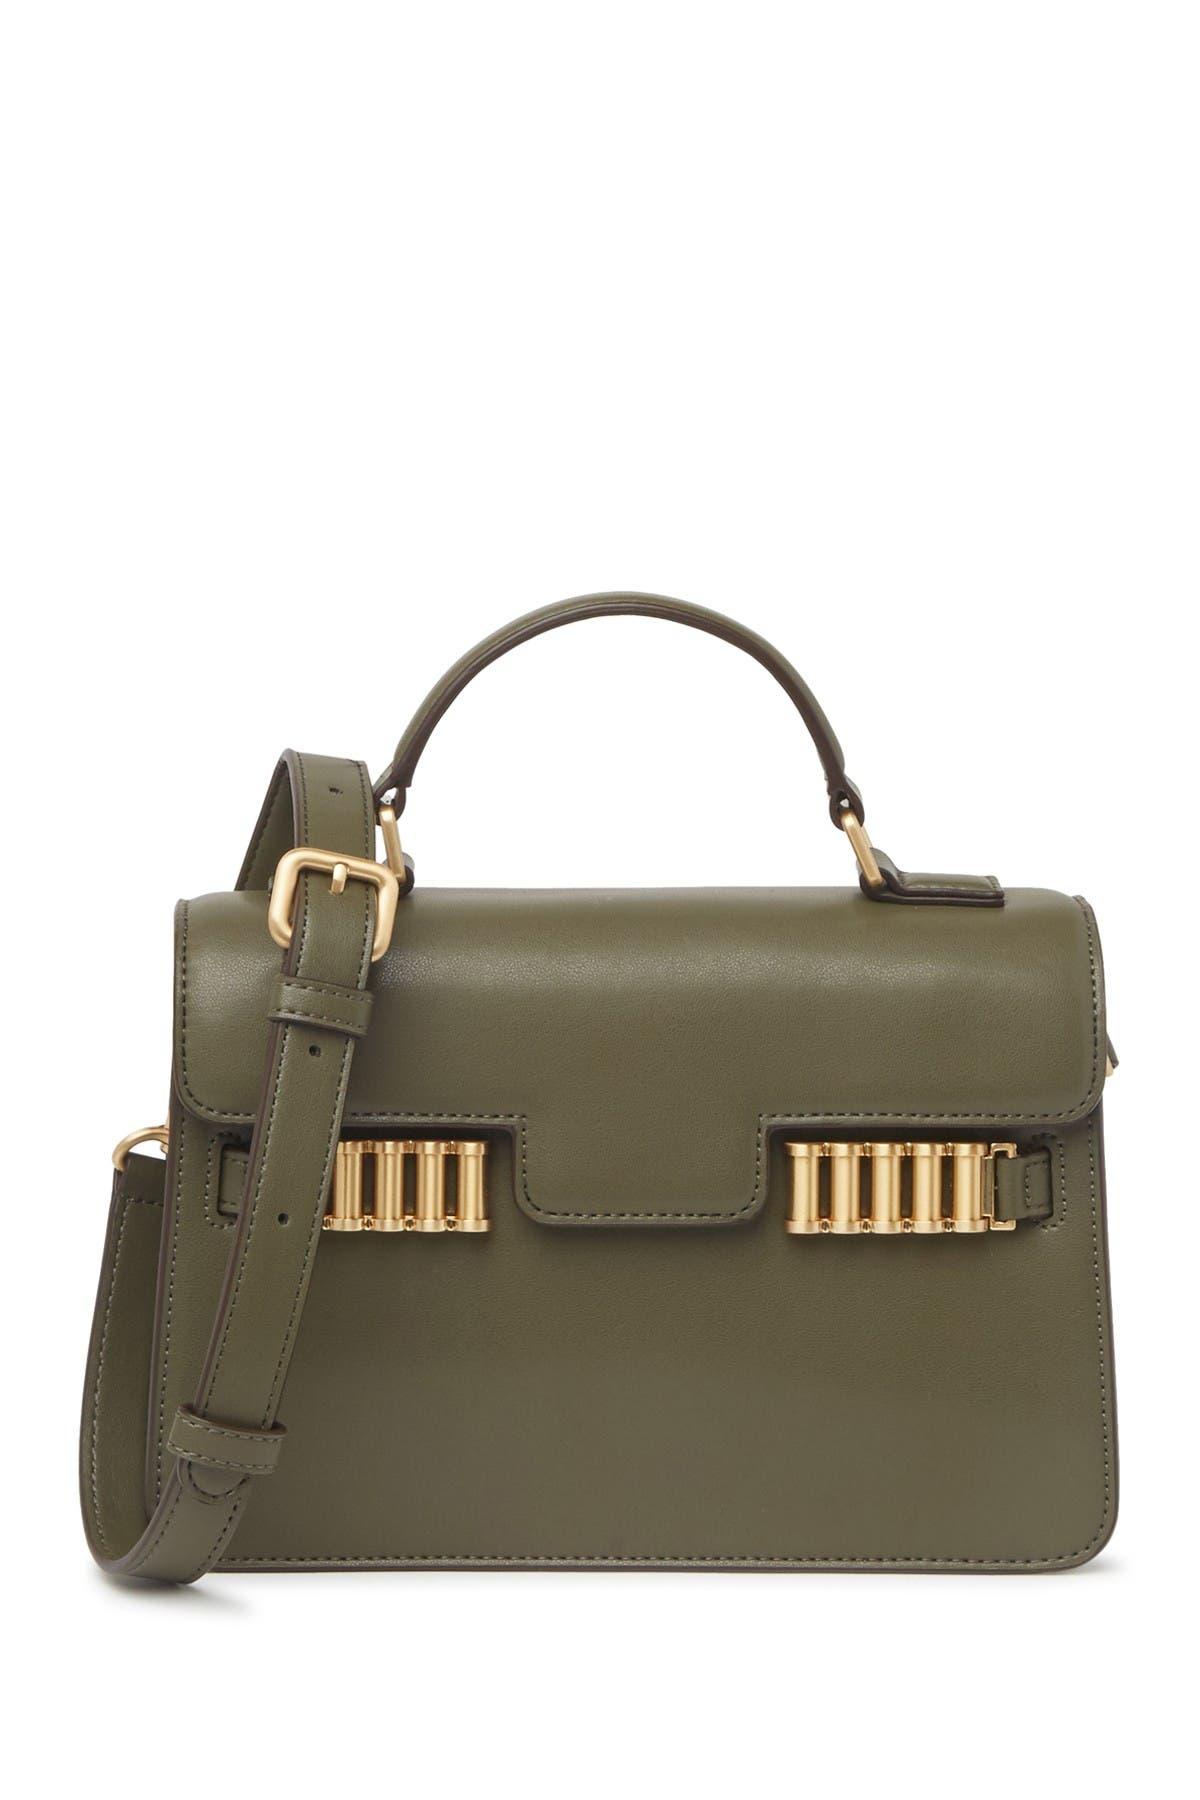 Image of Donna Karan Paola Small Leather Crossbody Bag